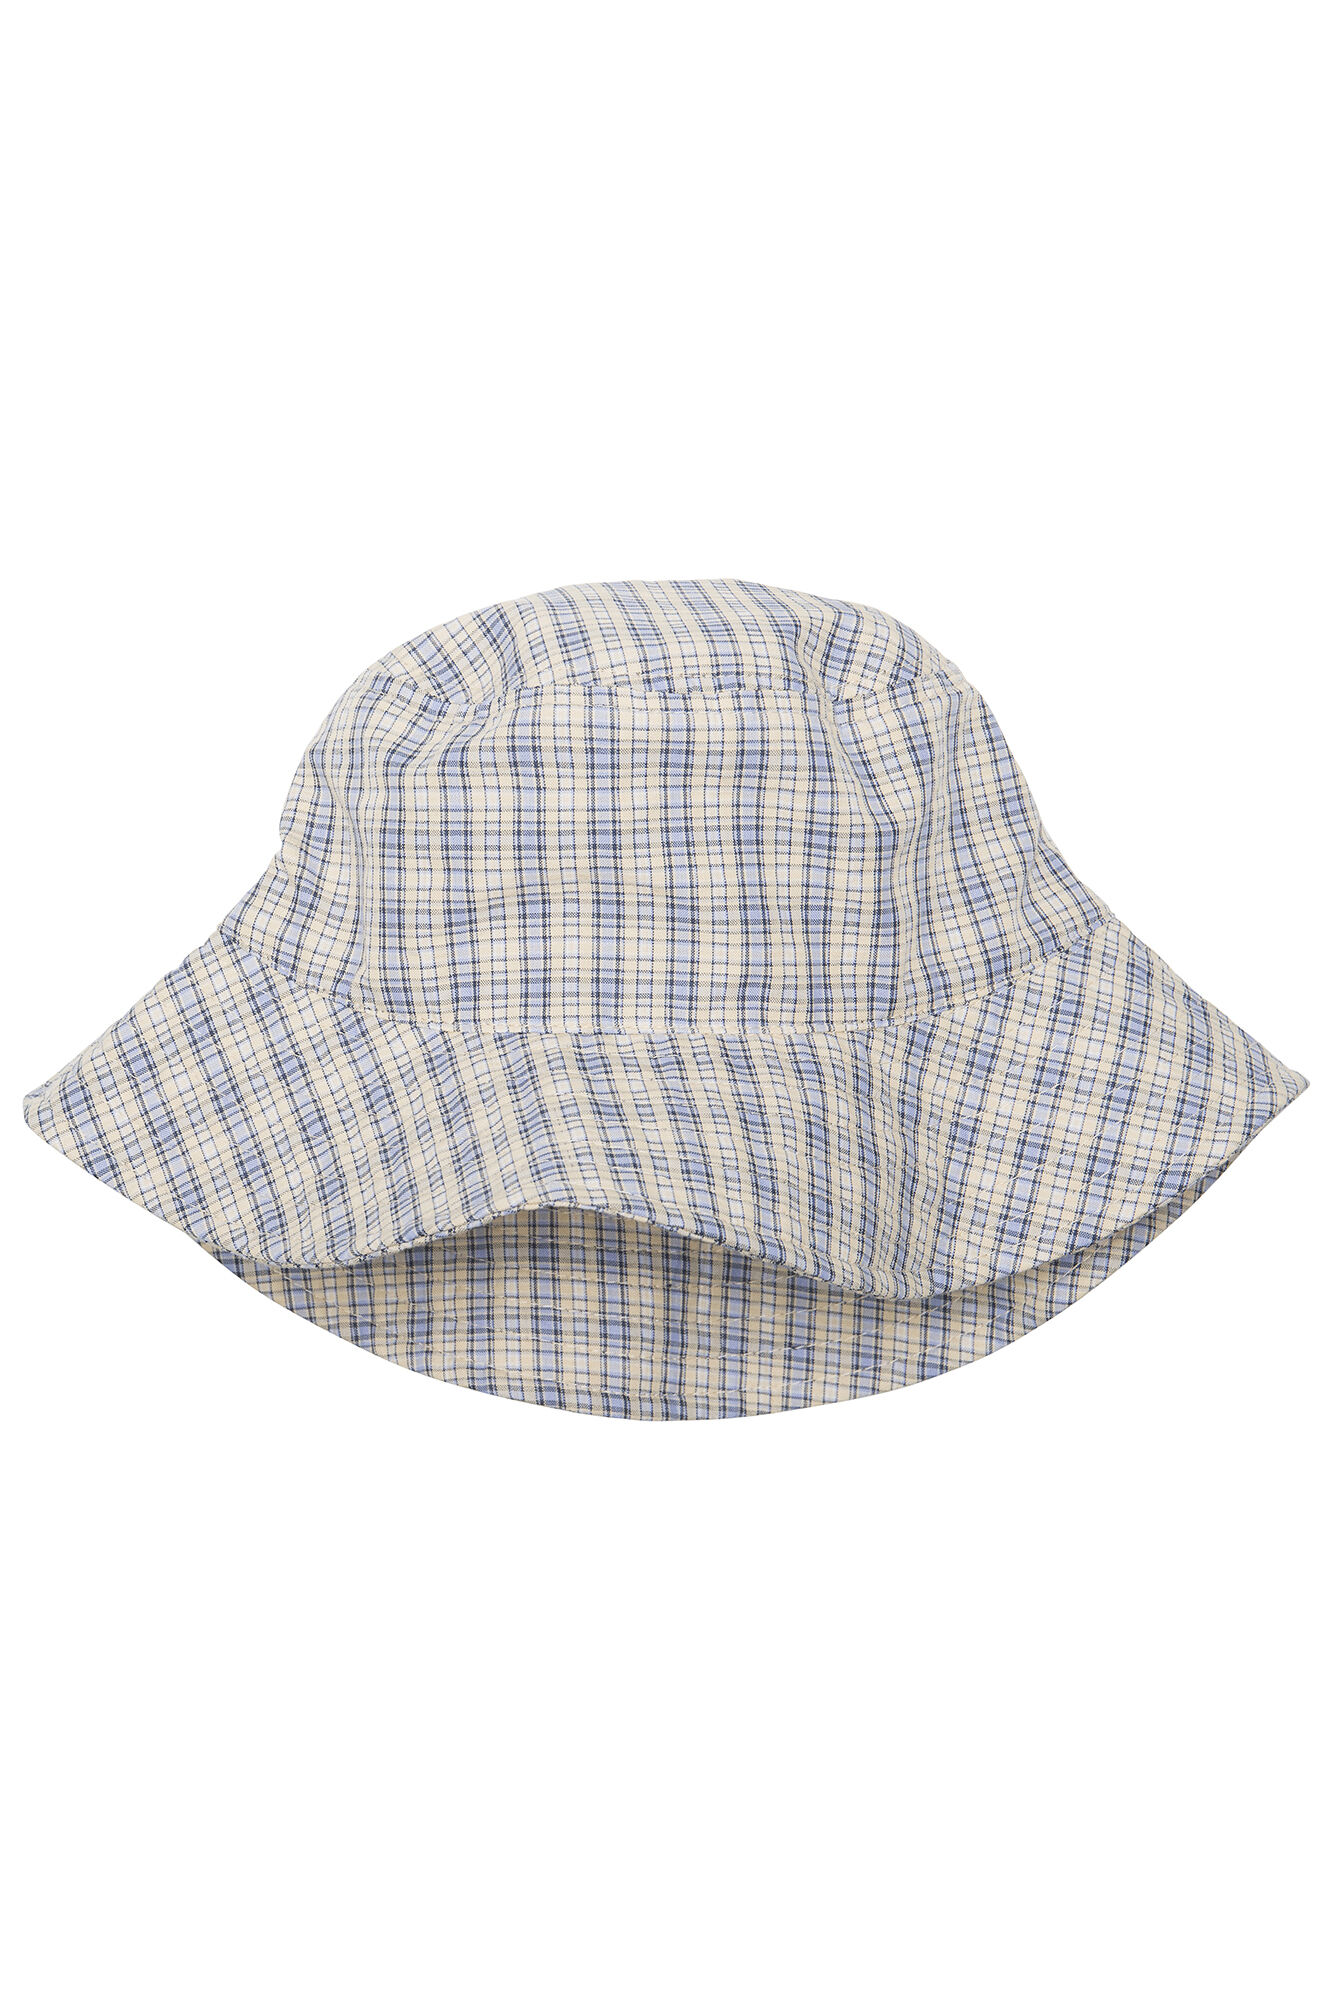 ENRAYES BUCKET HAT 6715